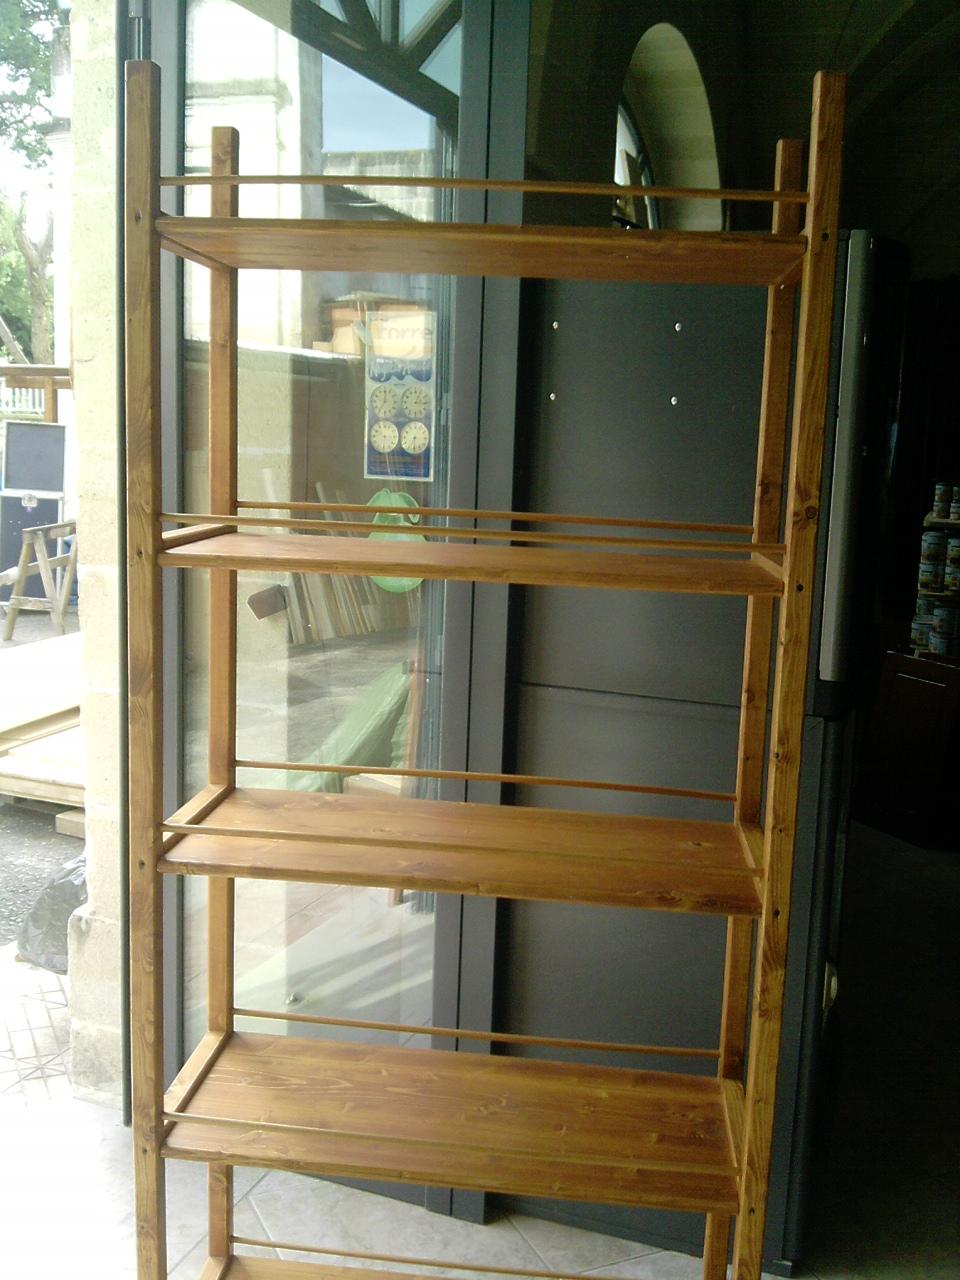 Fai da te hobby legno scaffale for Scaffali fai da te